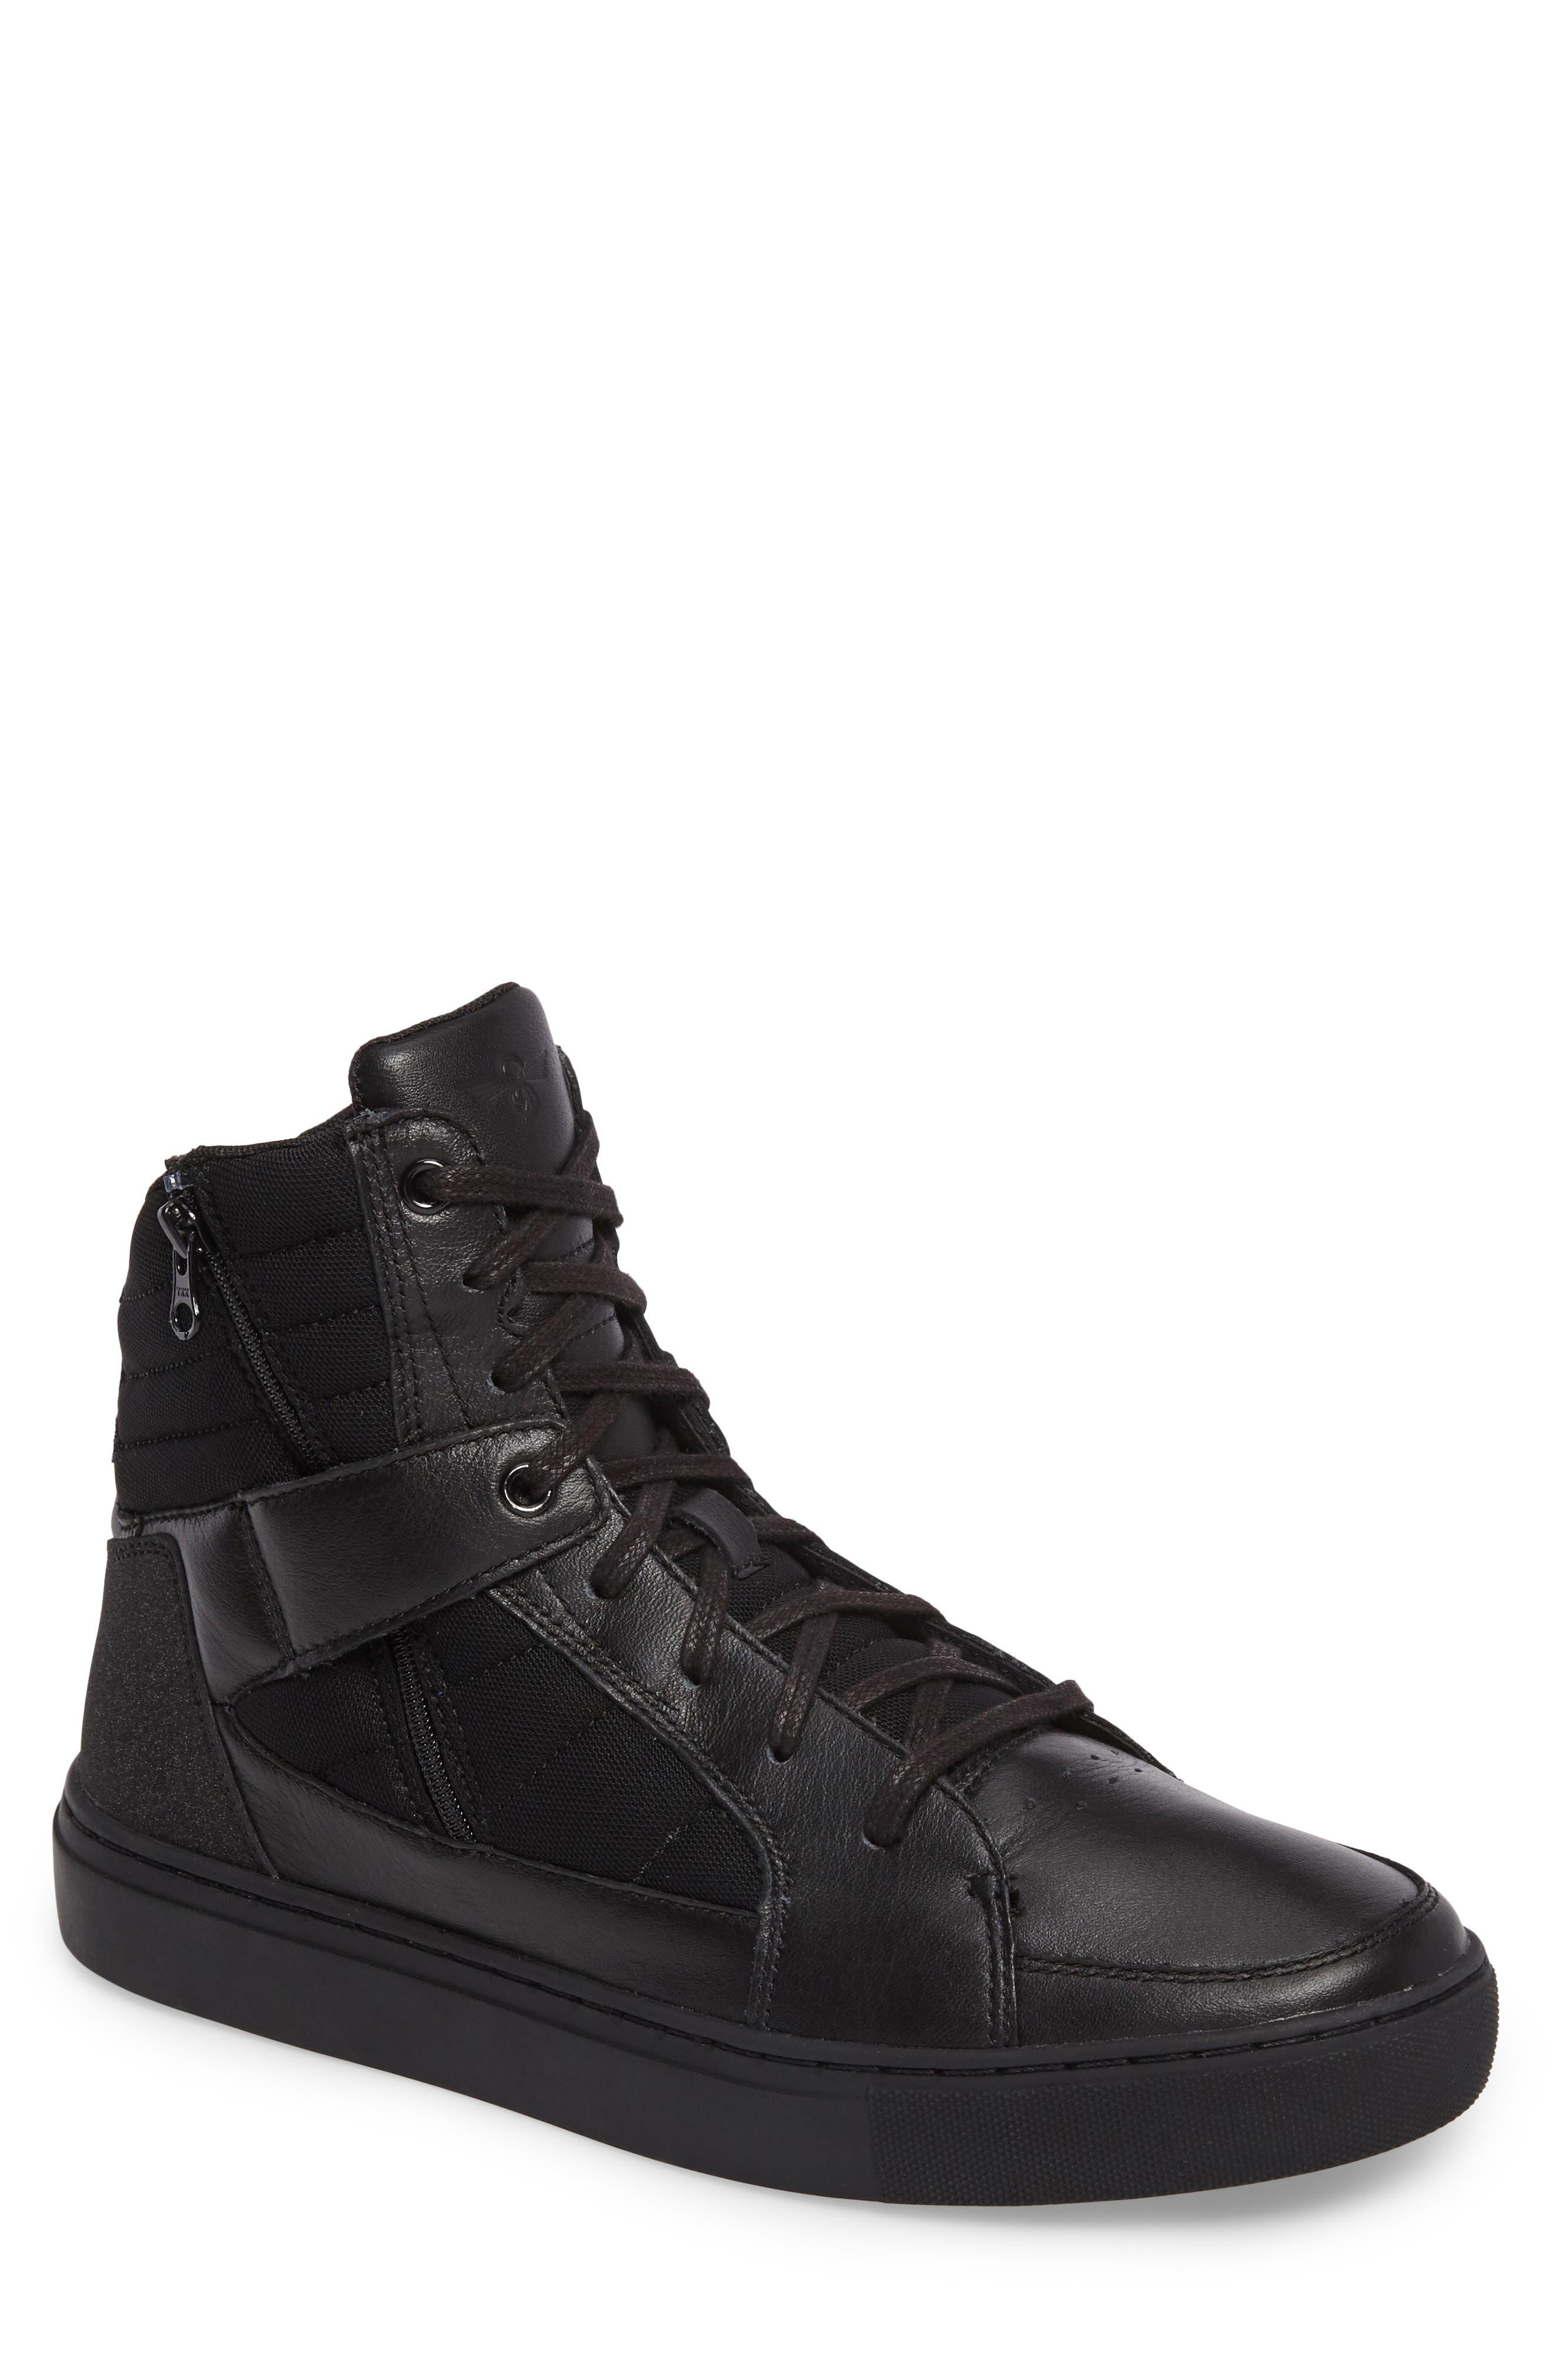 Main Image - Creative Recreation Varici Sneaker (Men)